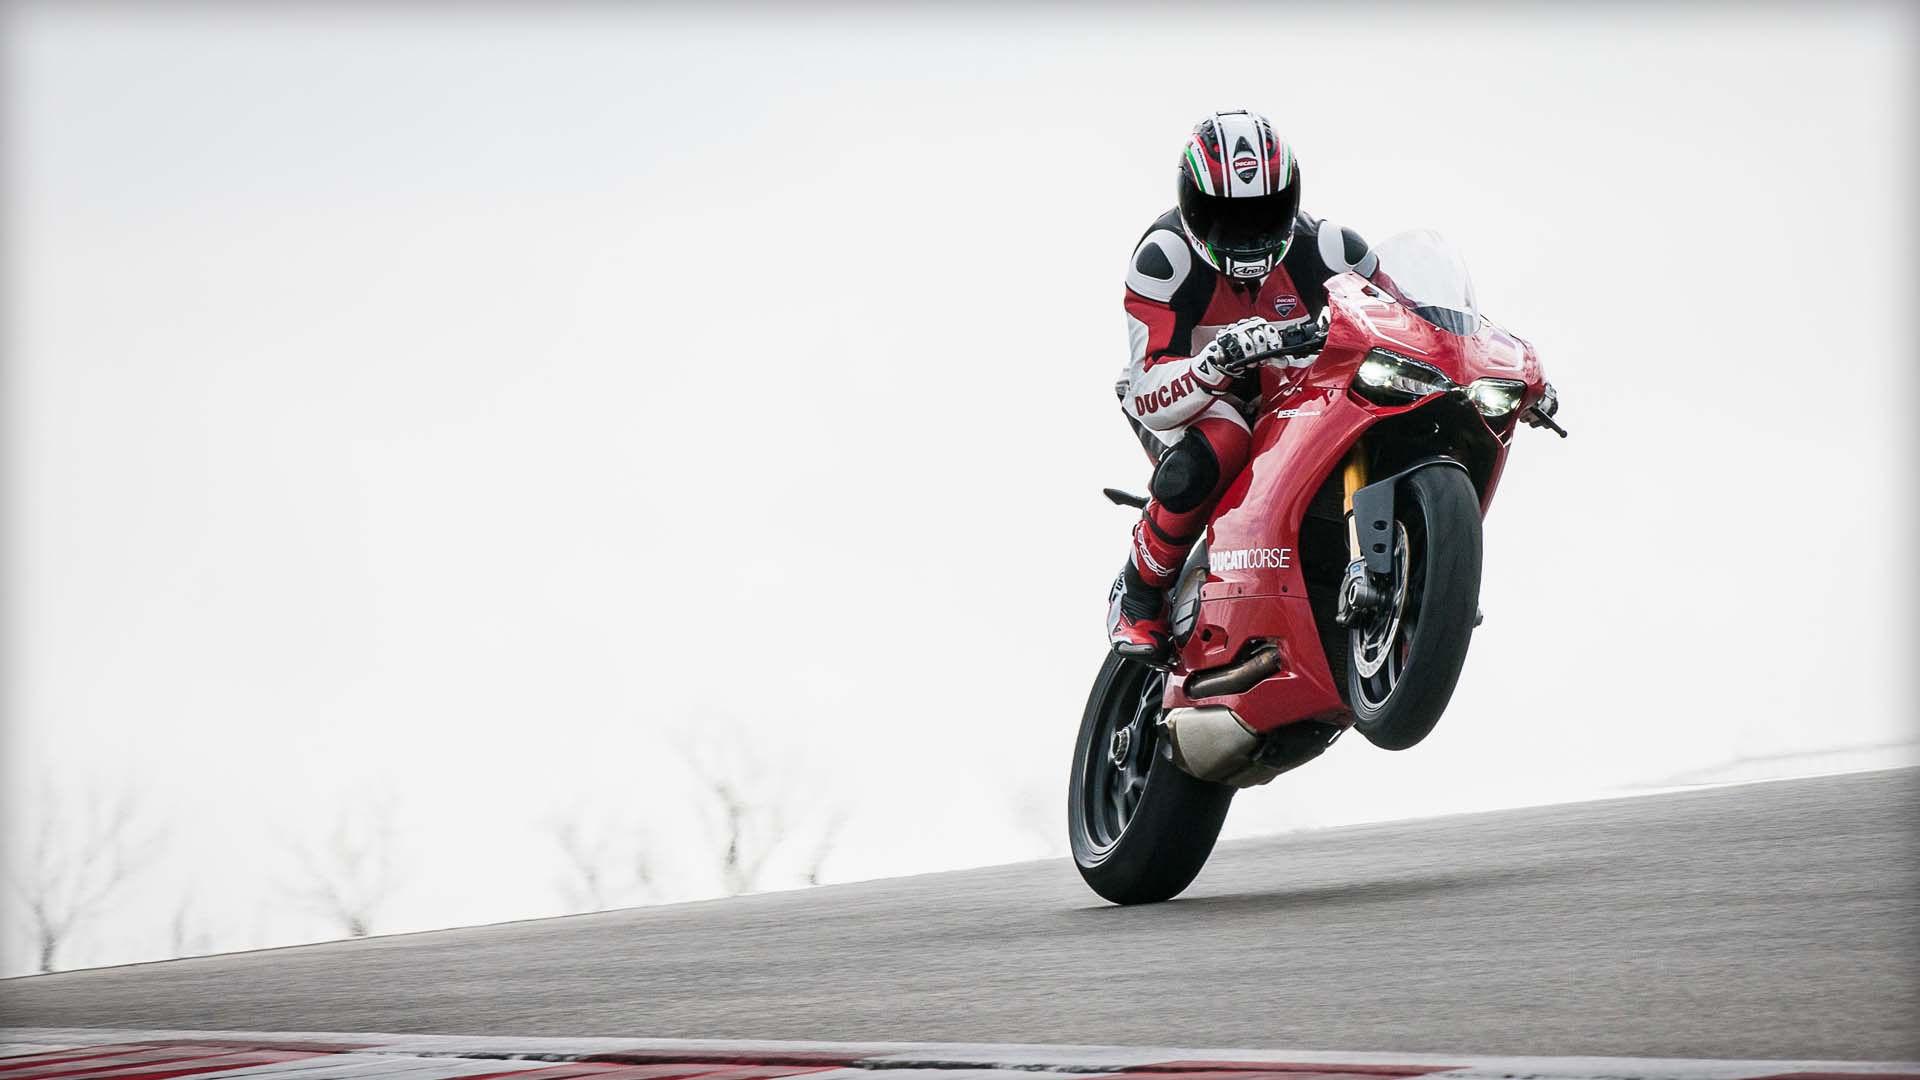 2014 Ducati  | Ducati 1199 Panigale R - Wheelie